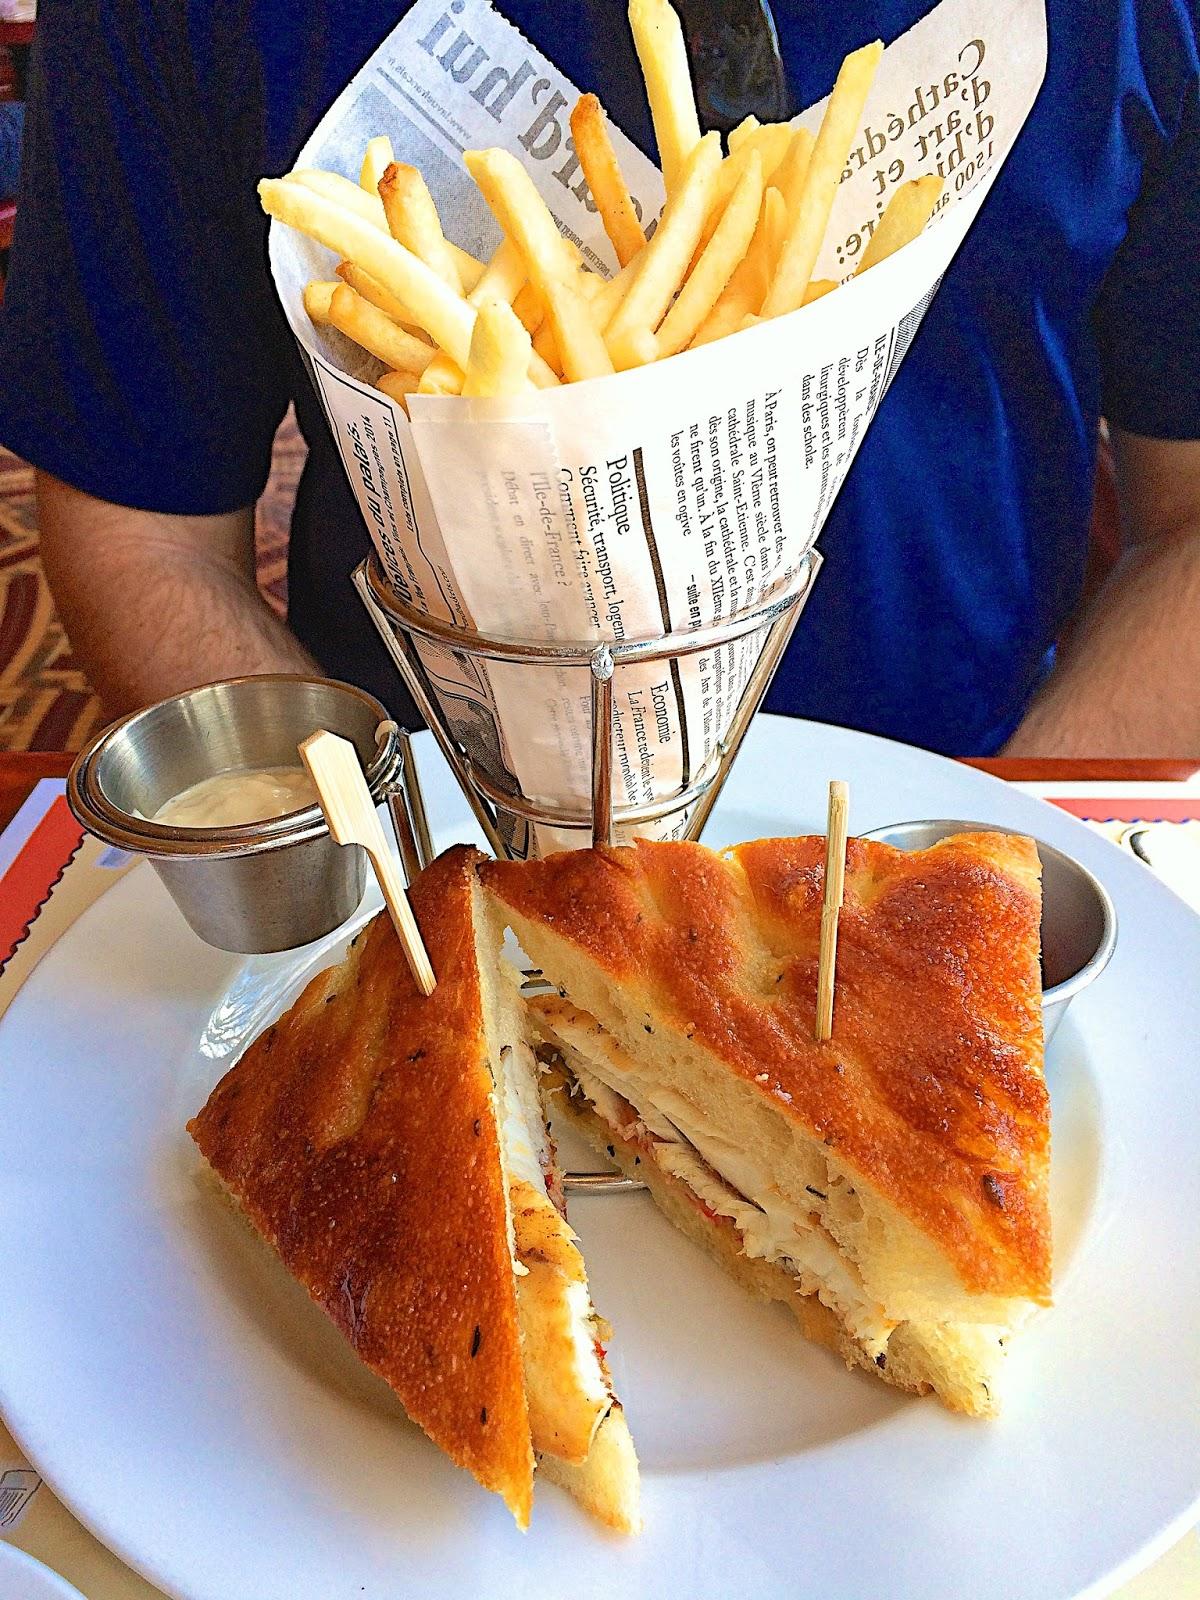 Mahi Mahi Sandwich - Les Chefs De France - Epcot - Walt Disney World